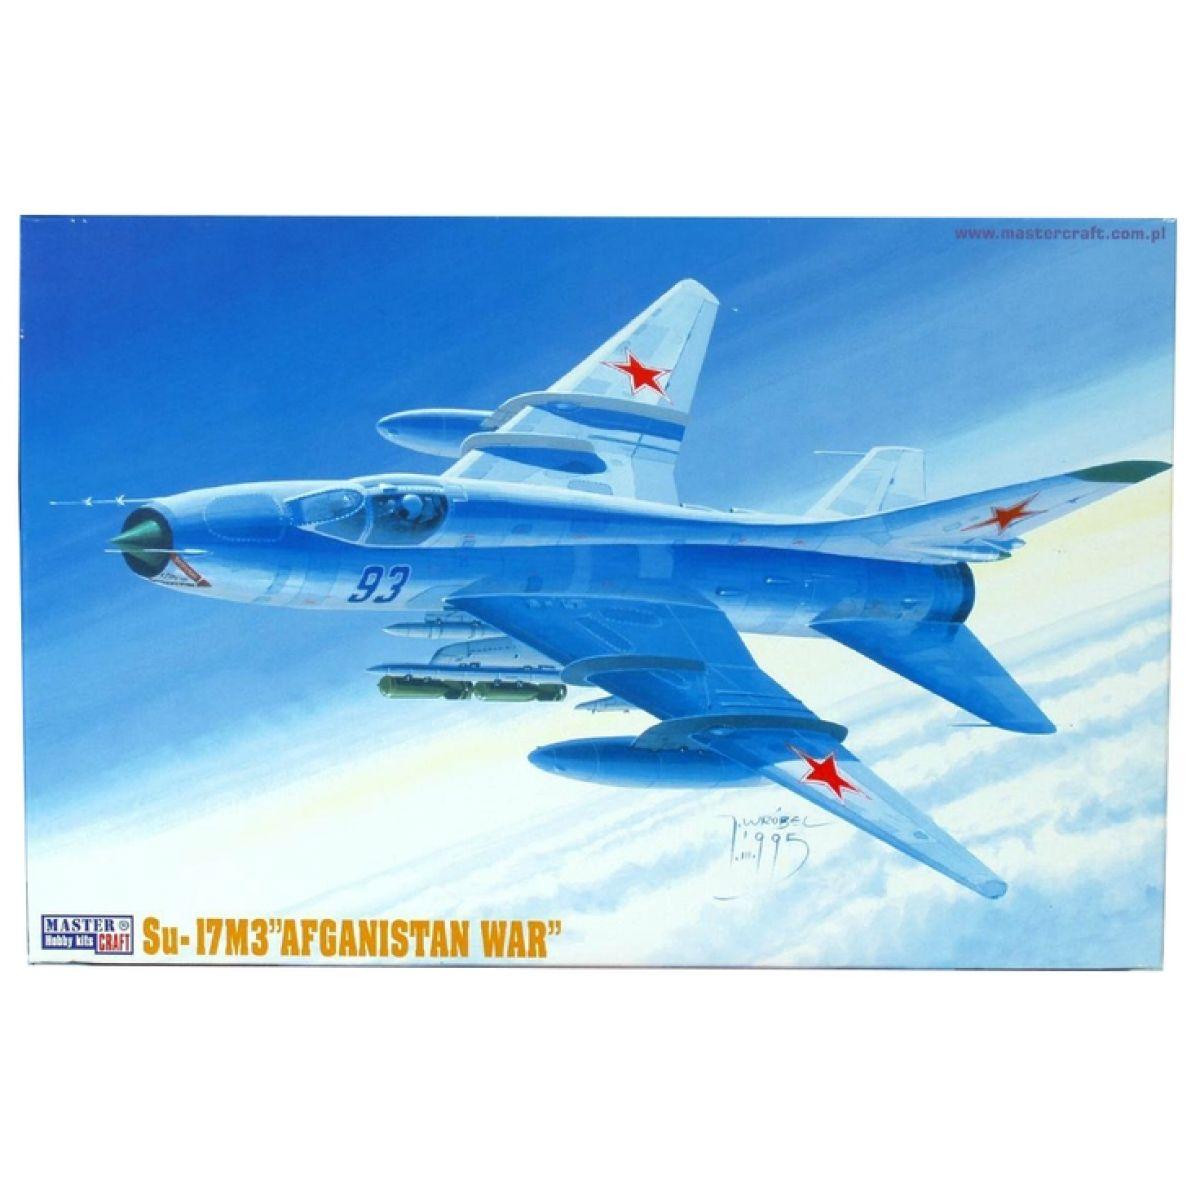 Model Su-17M3 Afganistan war série IV